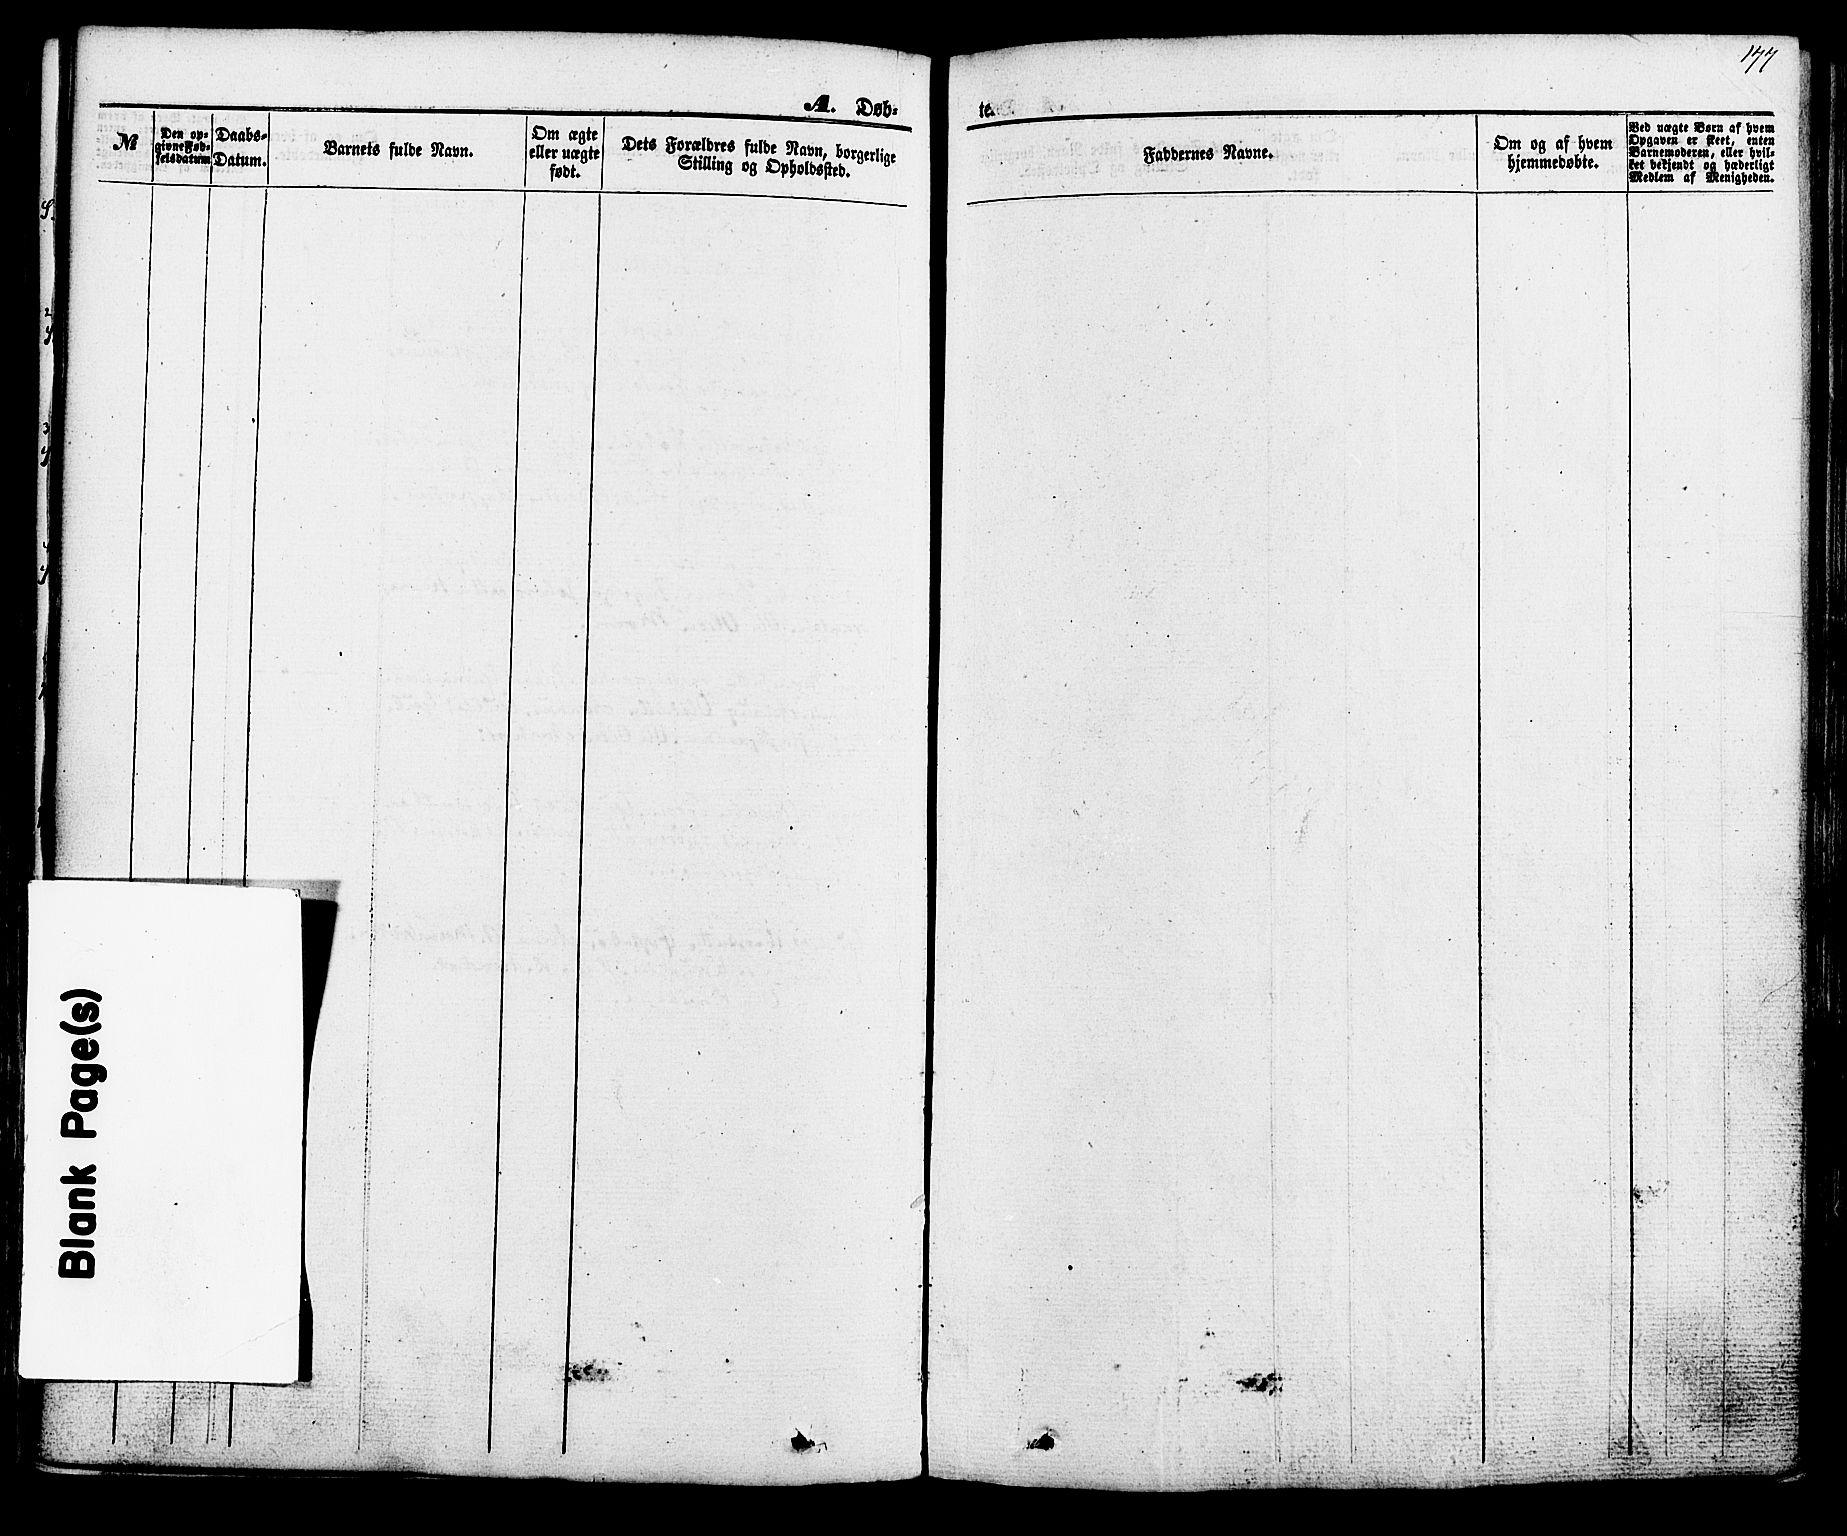 SAKO, Hjartdal kirkebøker, F/Fa/L0009: Ministerialbok nr. I 9, 1860-1879, s. 177